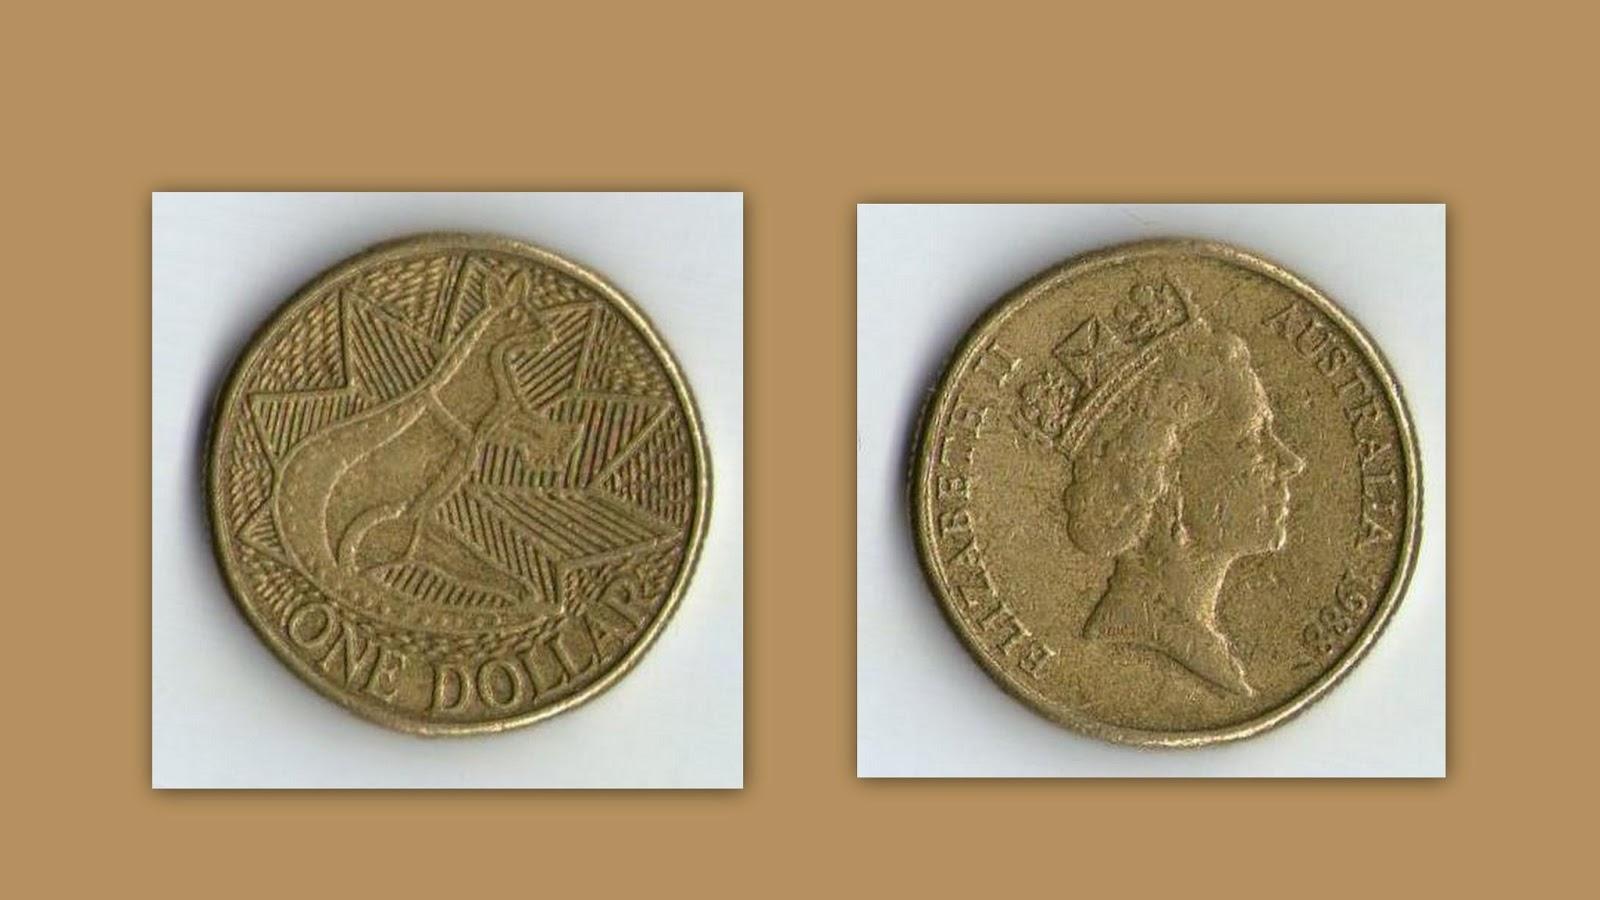 AUSTRALIA 1 DOLLAR 2005 WORLD WAR PEACE COMMEMORATIVE